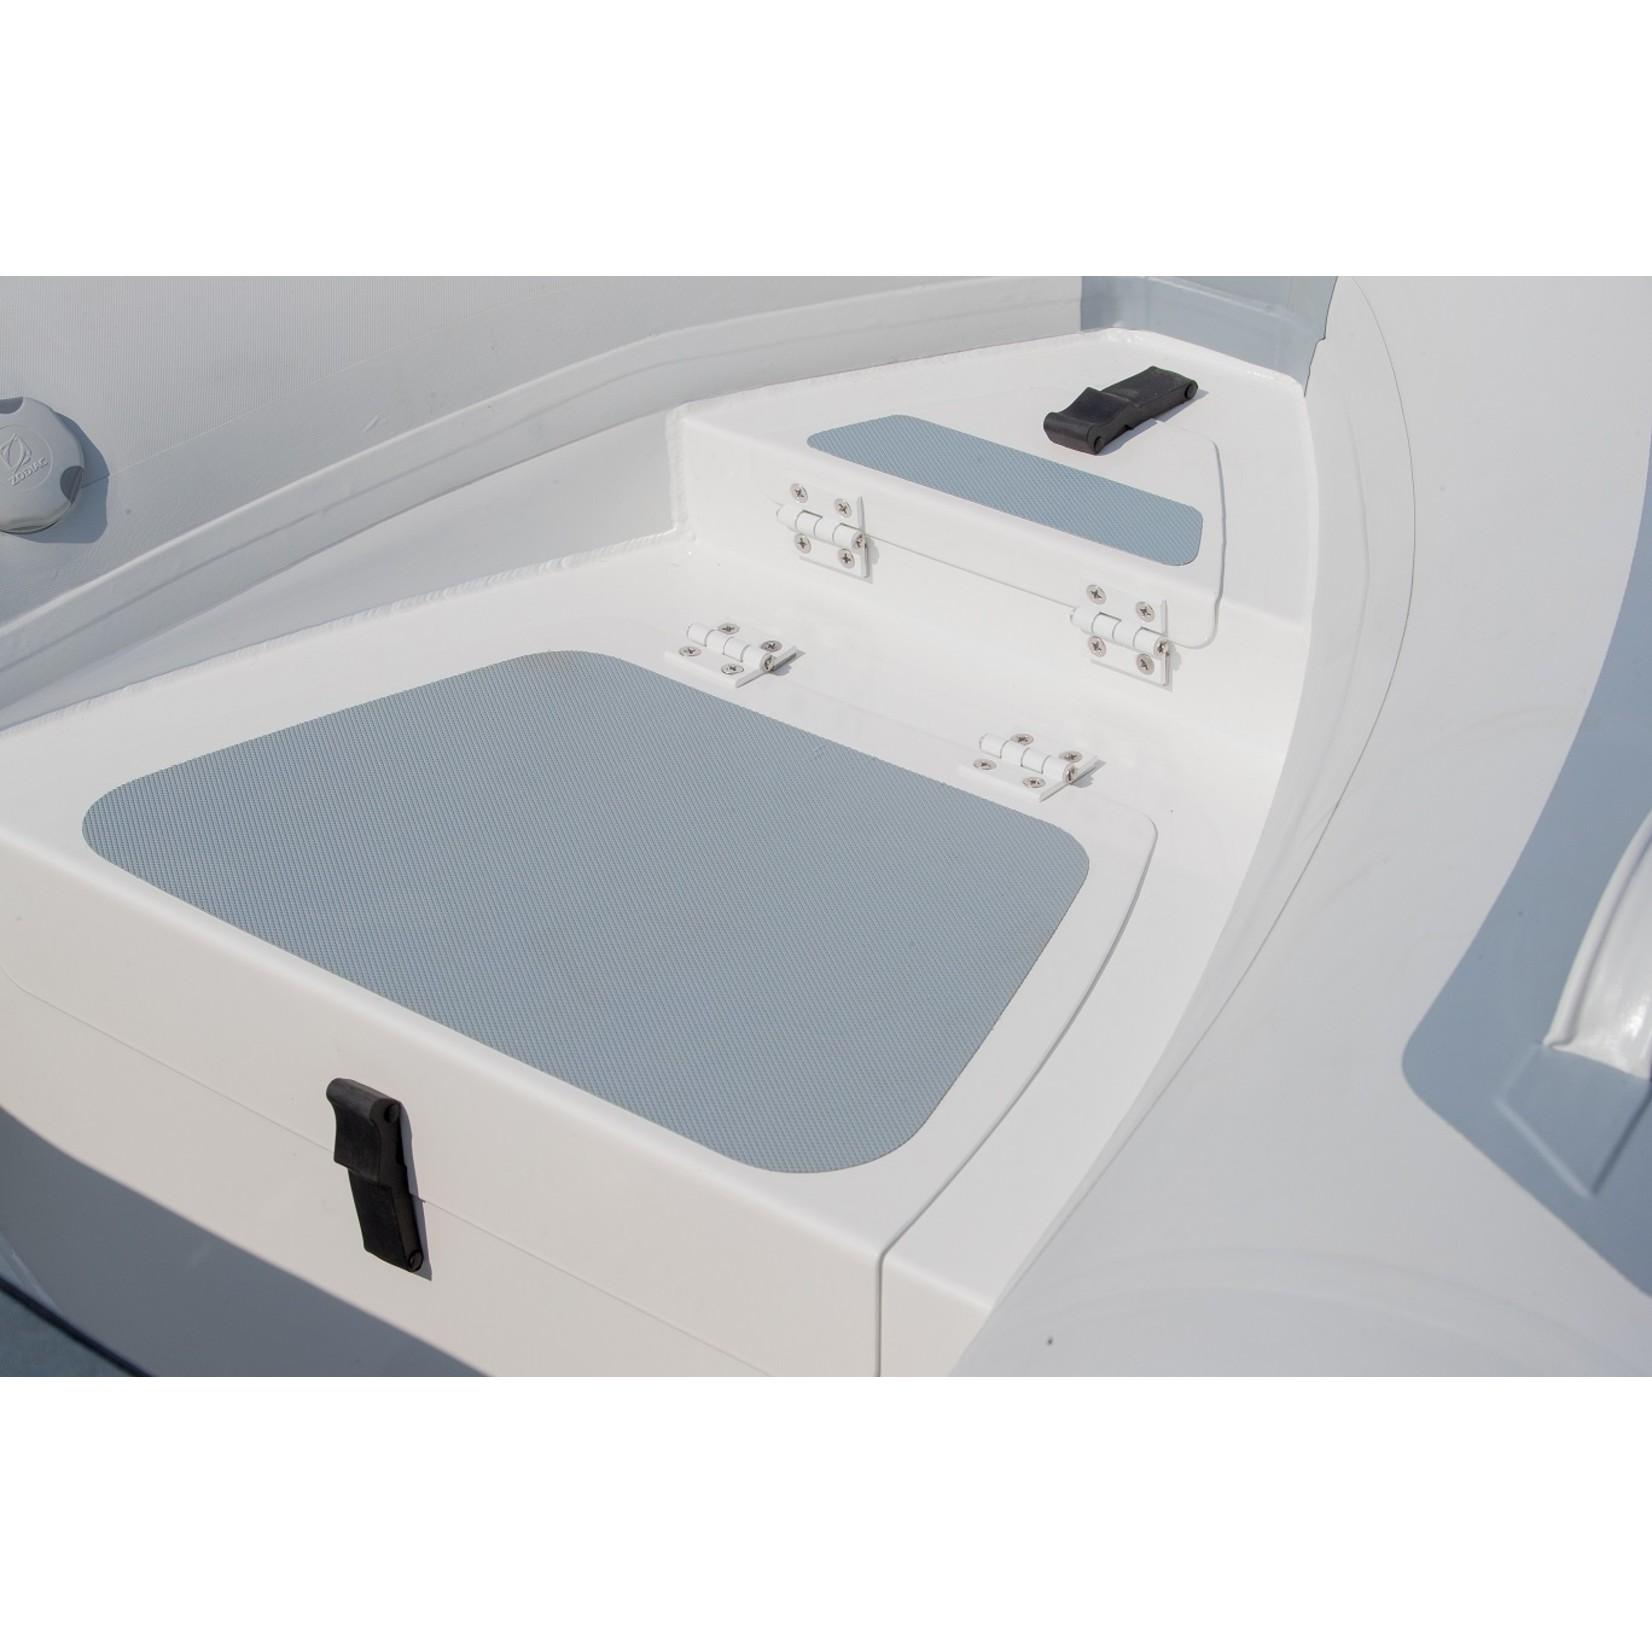 Zodiac Cadet 300 DL ALU RIB - Deck & Locker (3.03 mtr.)